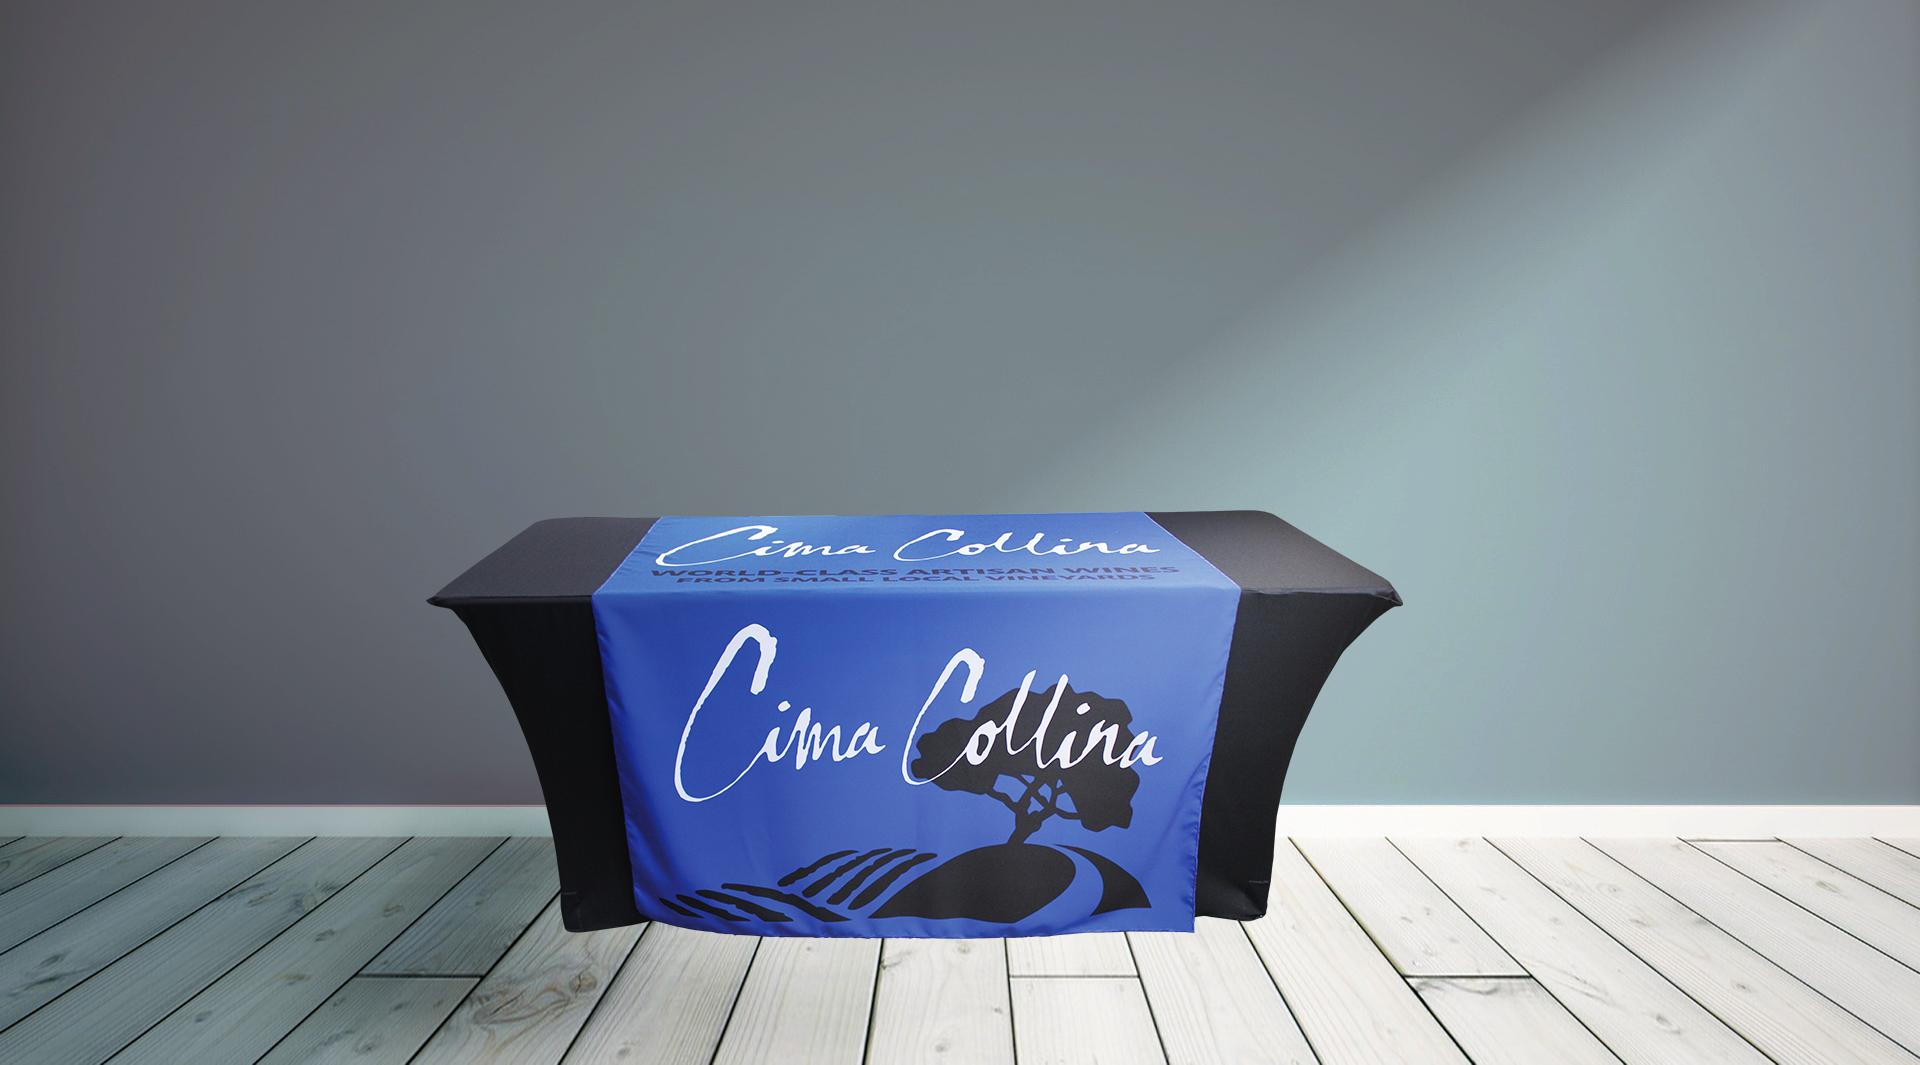 Cima Collina Table Runner Grey Wall.jpg